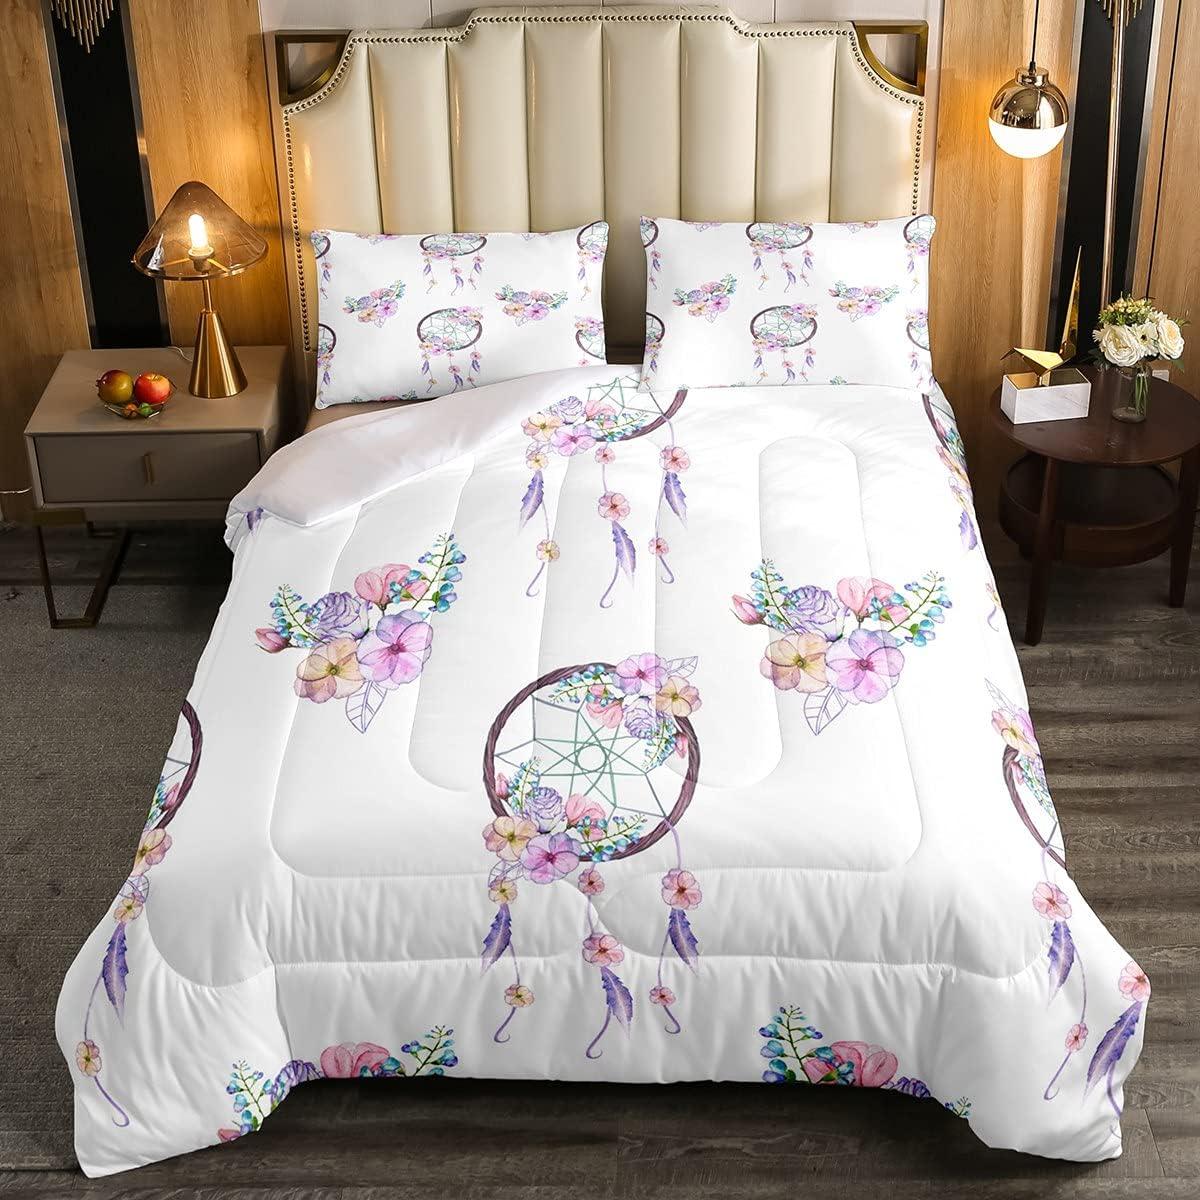 Max 70% OFF Manfei Dreamcatcher Comforter half Set Full Inser Size Bohemian Duvet